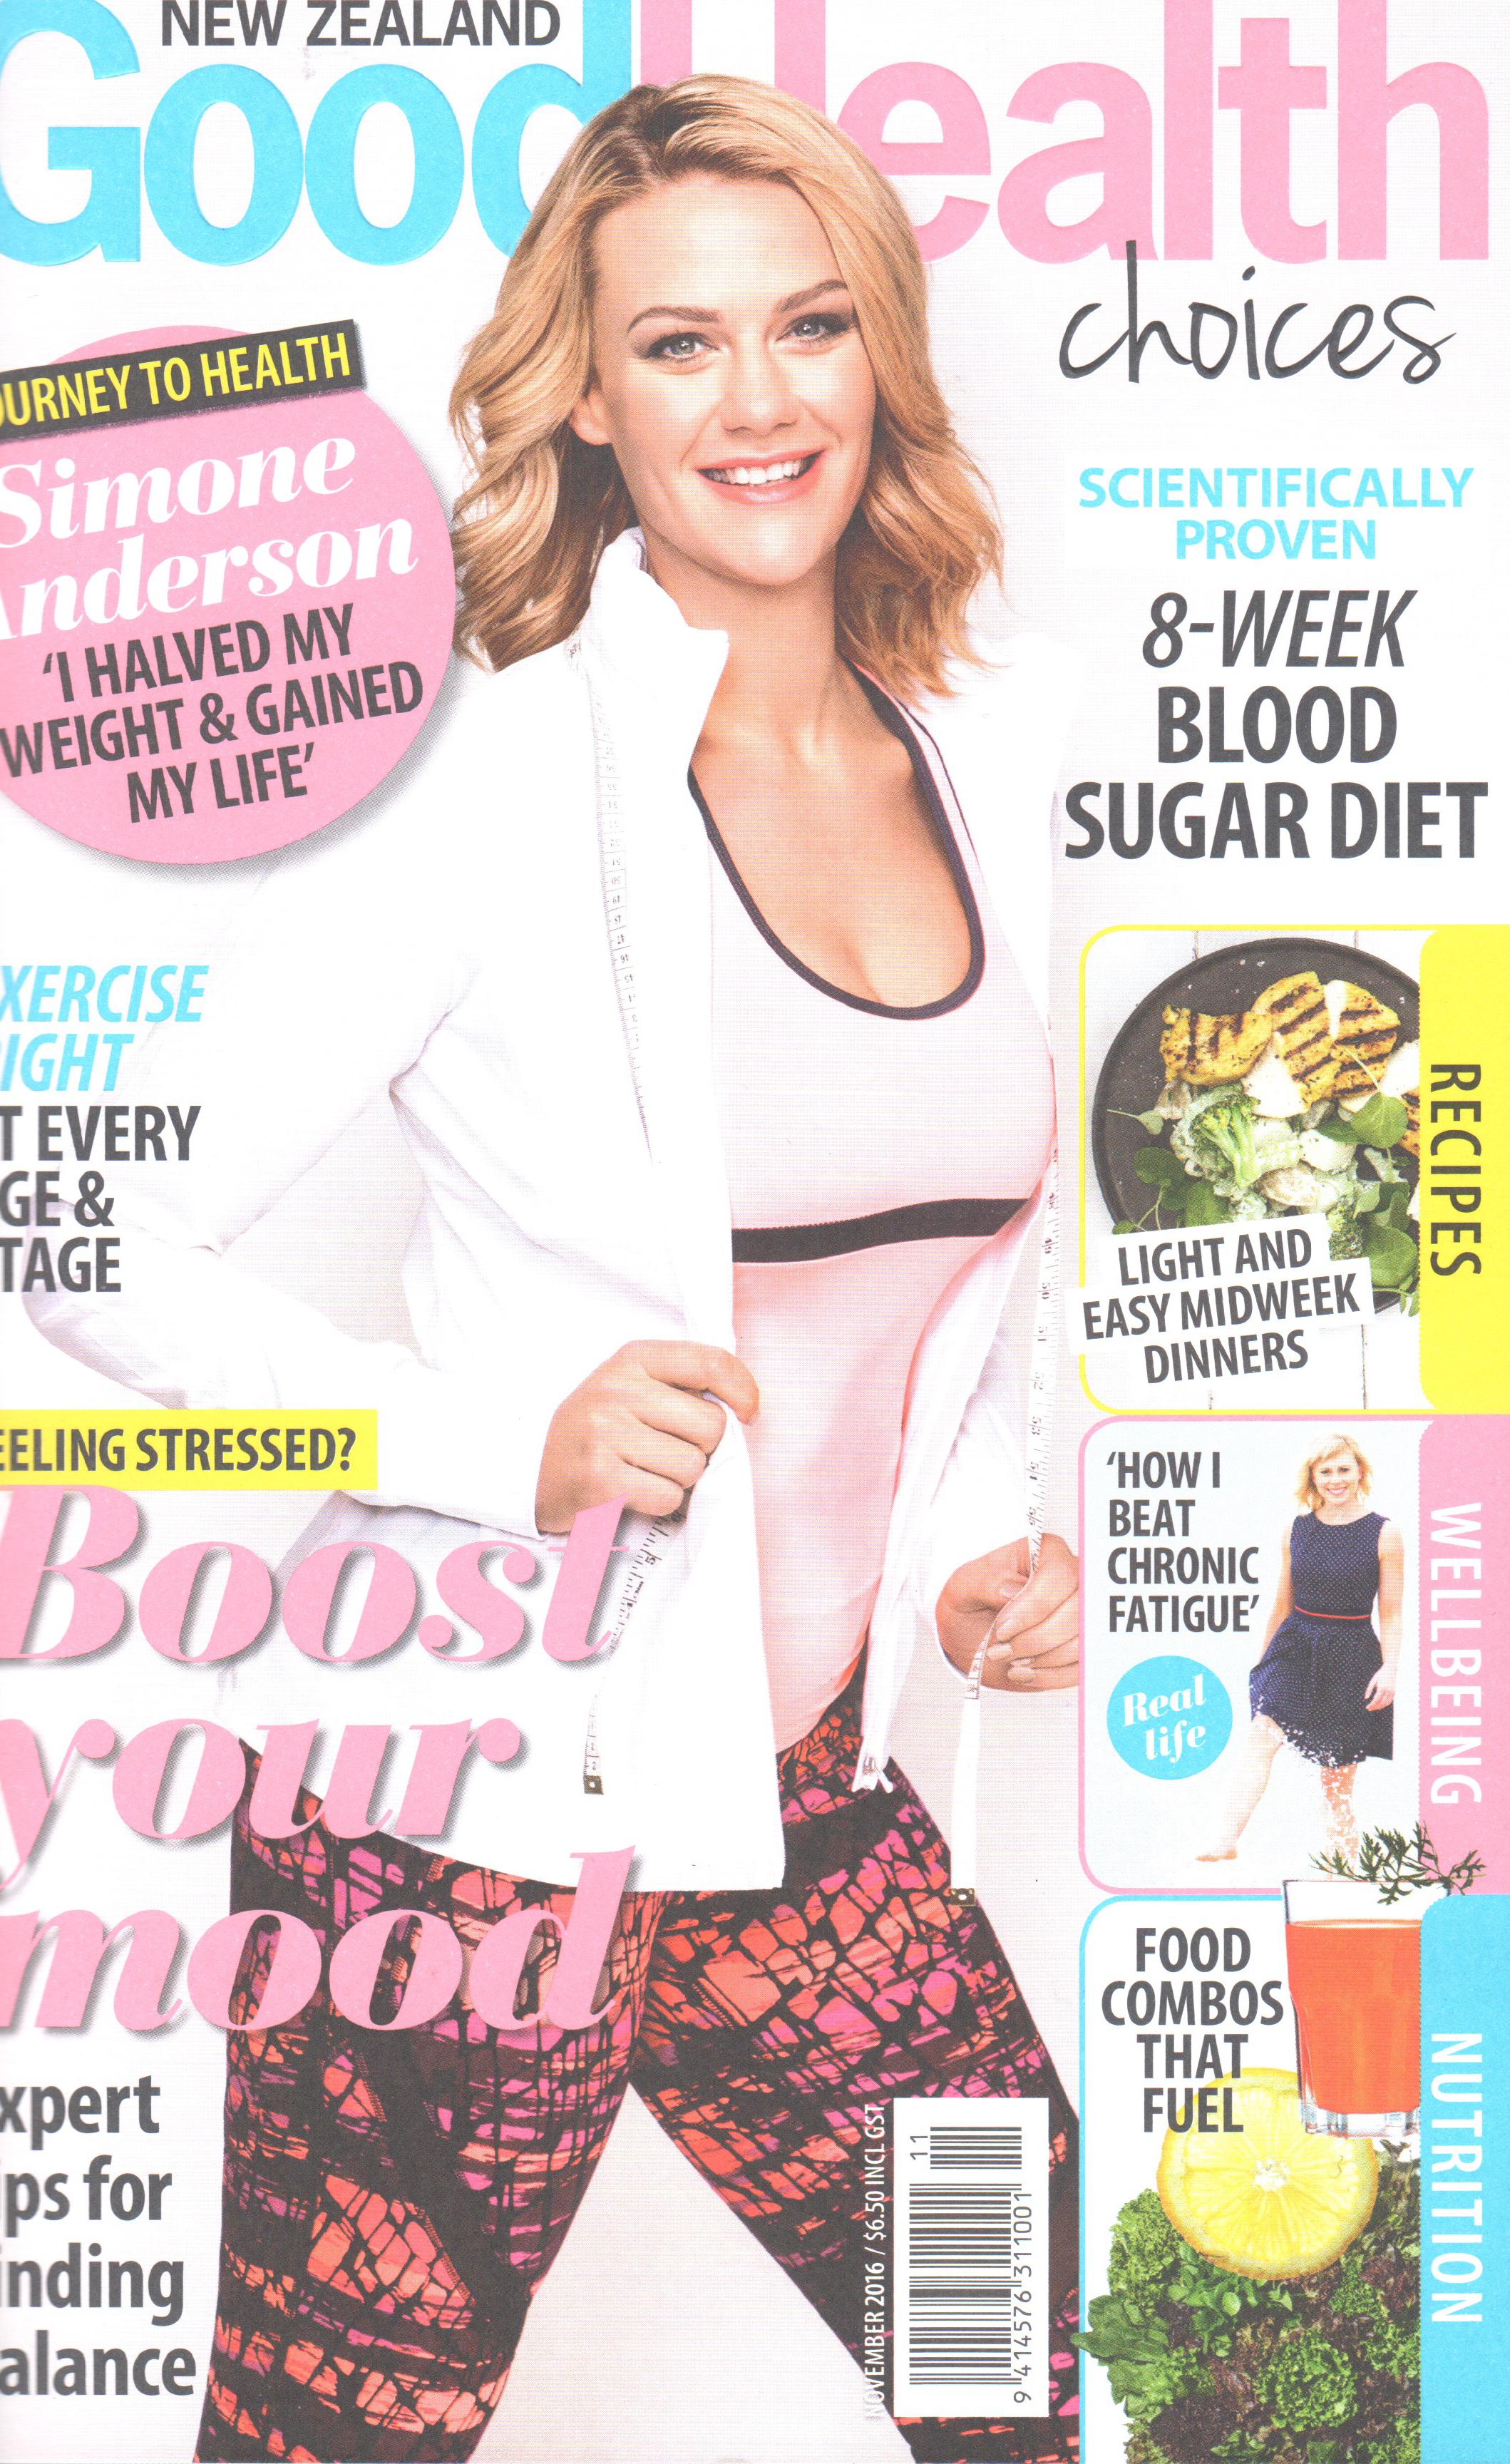 Good Health Choices Nov 16 cover.jpg